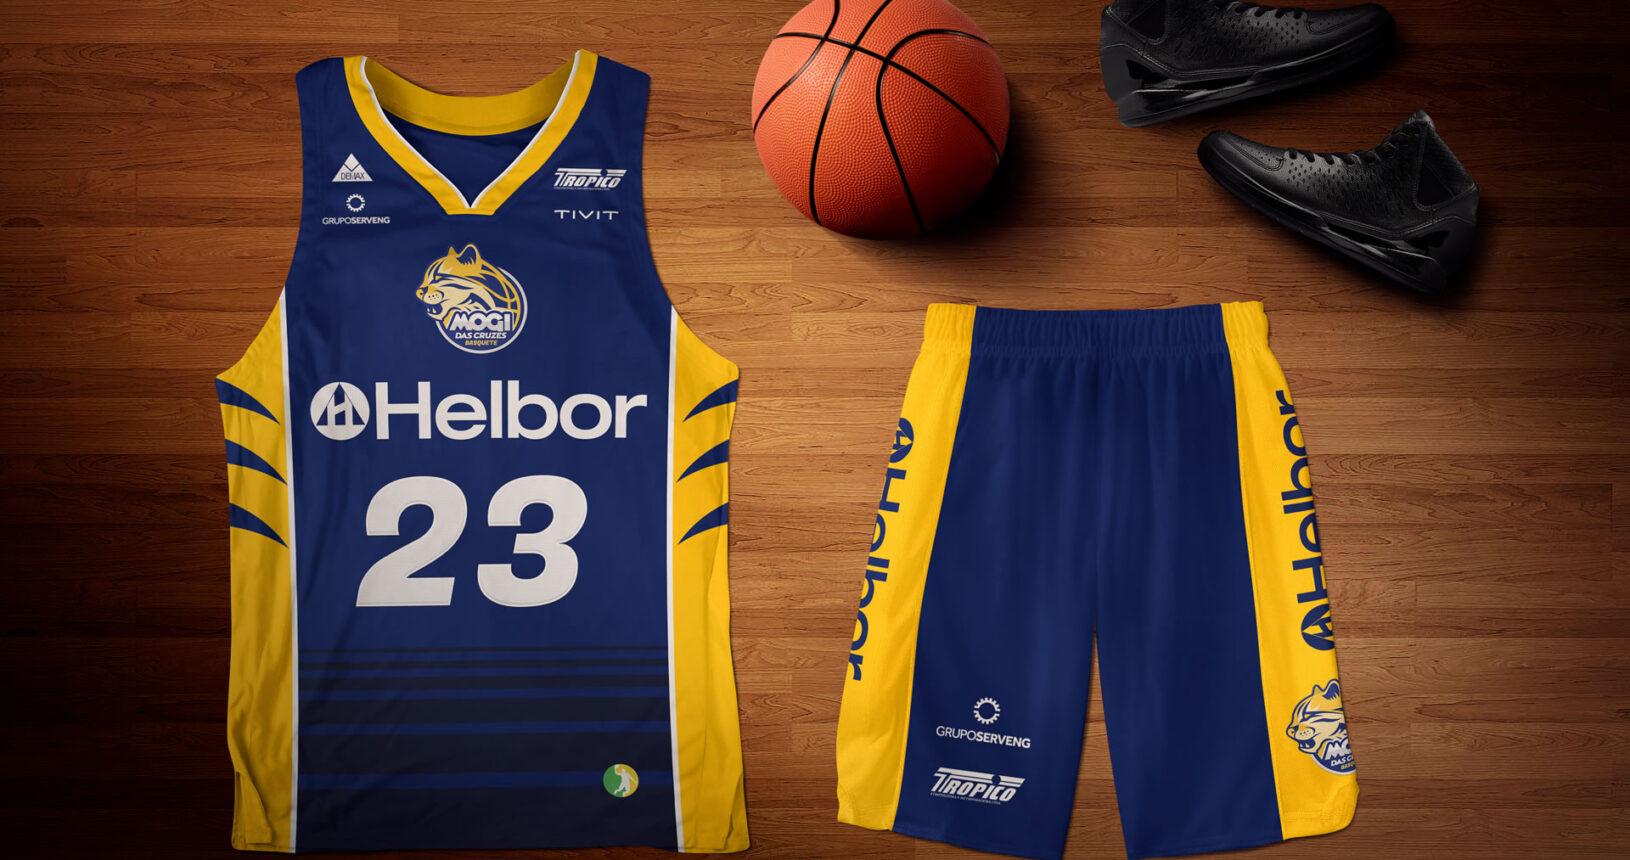 mogi cruzes basquete uniforme azul